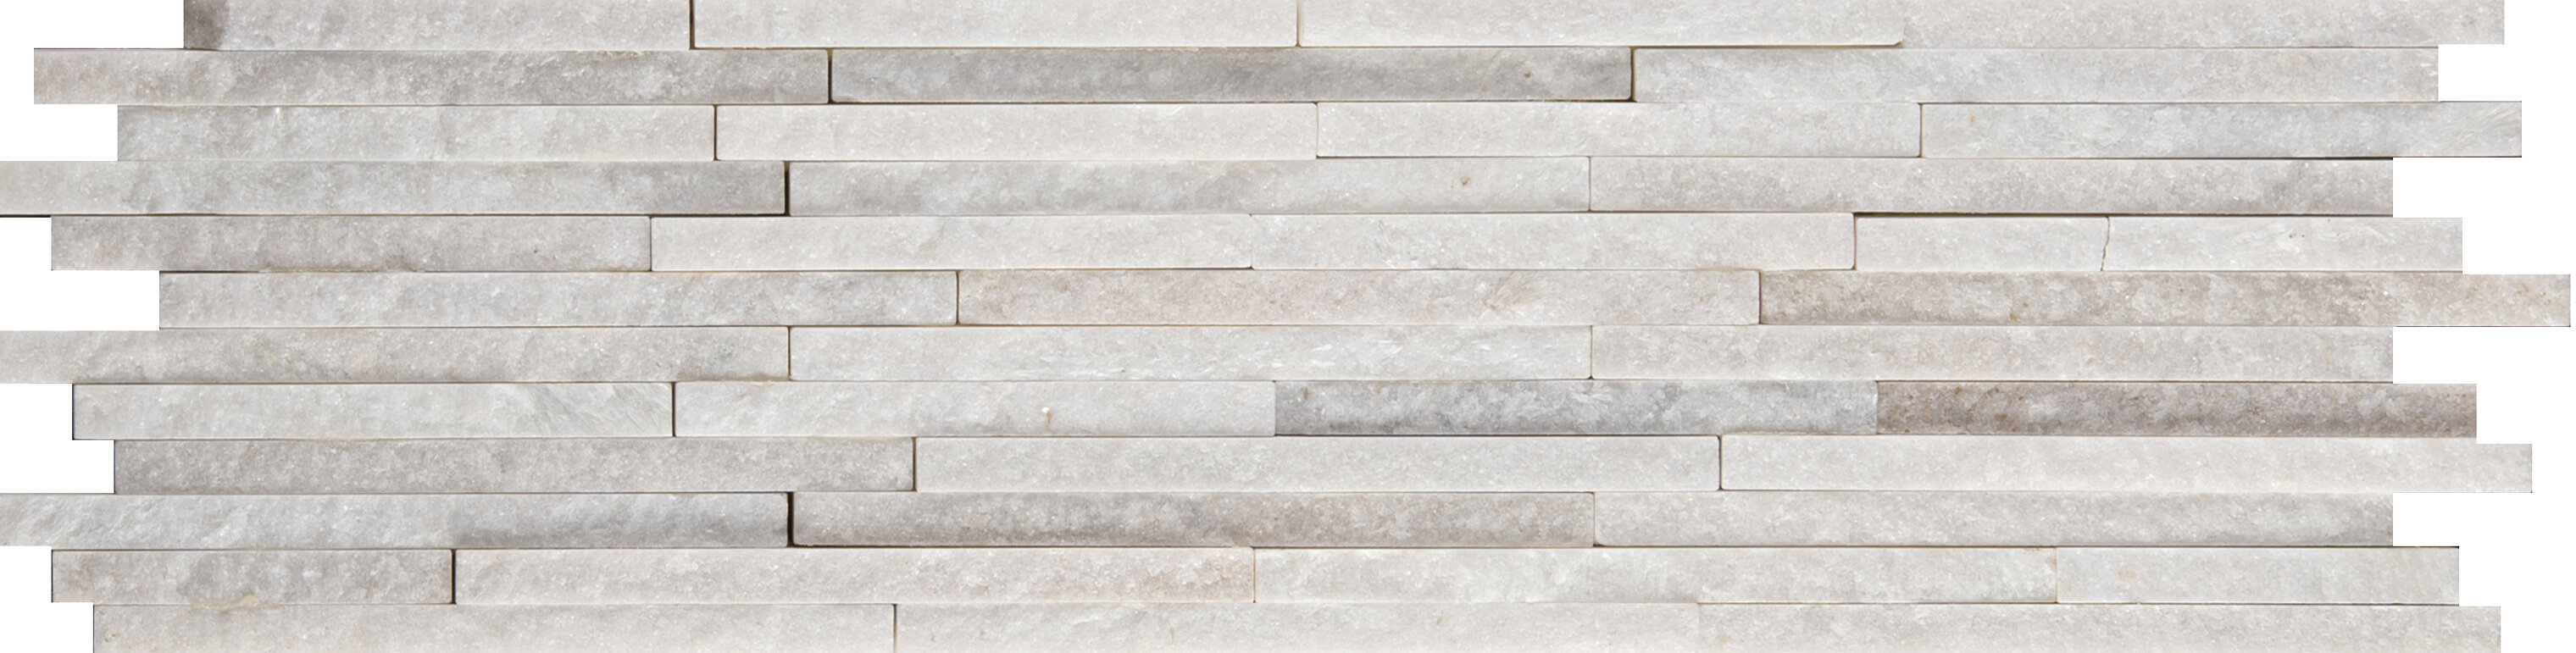 "Emser Tile Natural Stone Mini Stacked Slate 6"" x 24"" Quartzite"